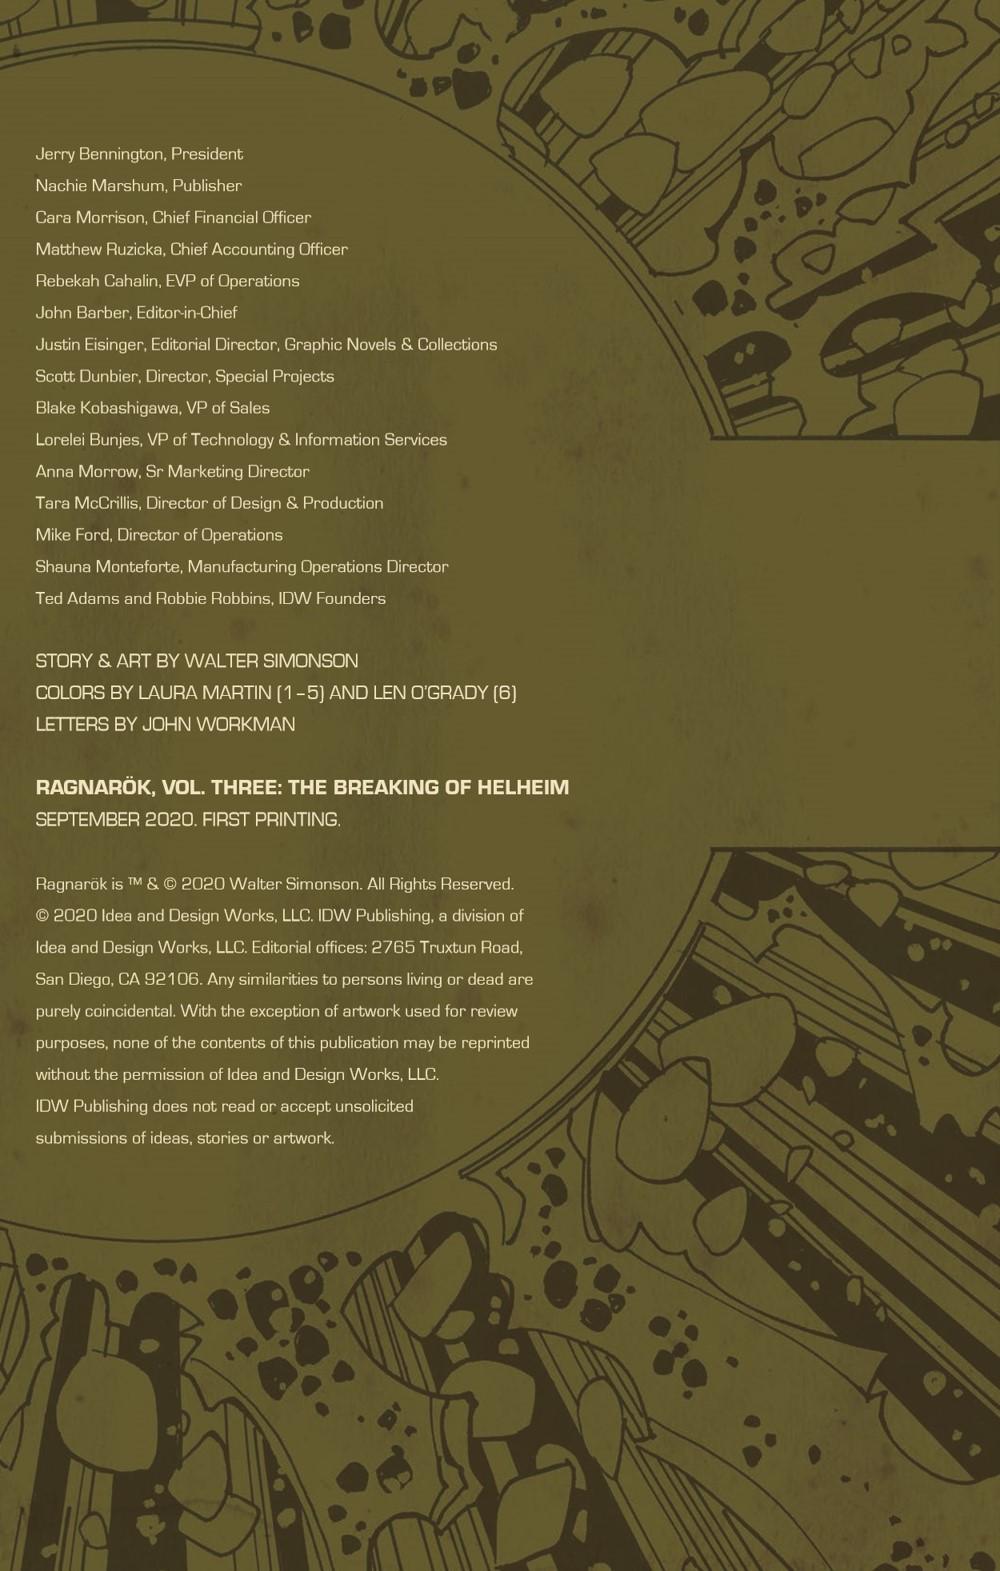 Ragnarok03-HC_pr-3 ComicList Previews: RAGNAROK VOLUME 3 THE BREAKING OF HELHEIM HC